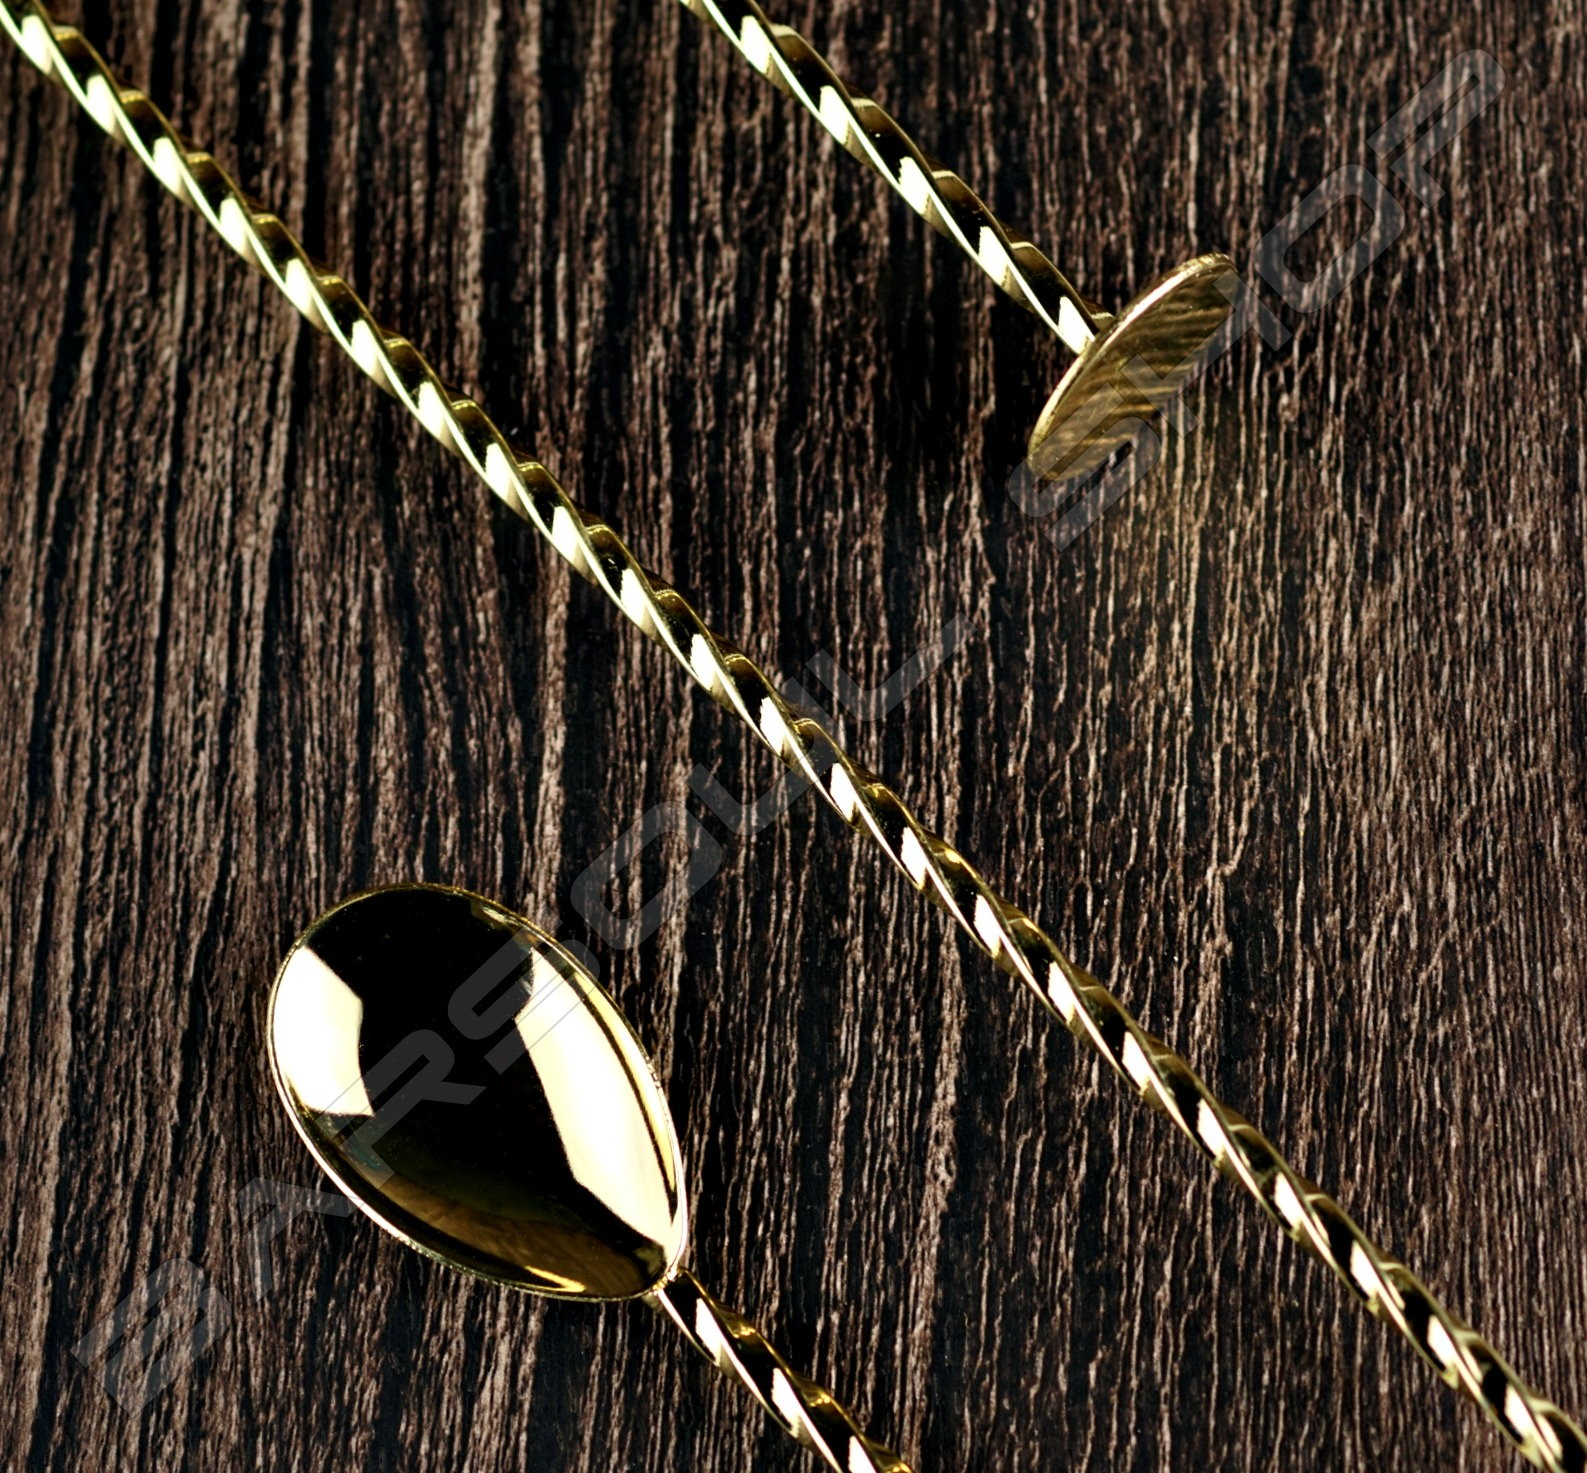 30cm螺旋平底吧叉匙(金色) Spiral Flat Barspoon (Gold)